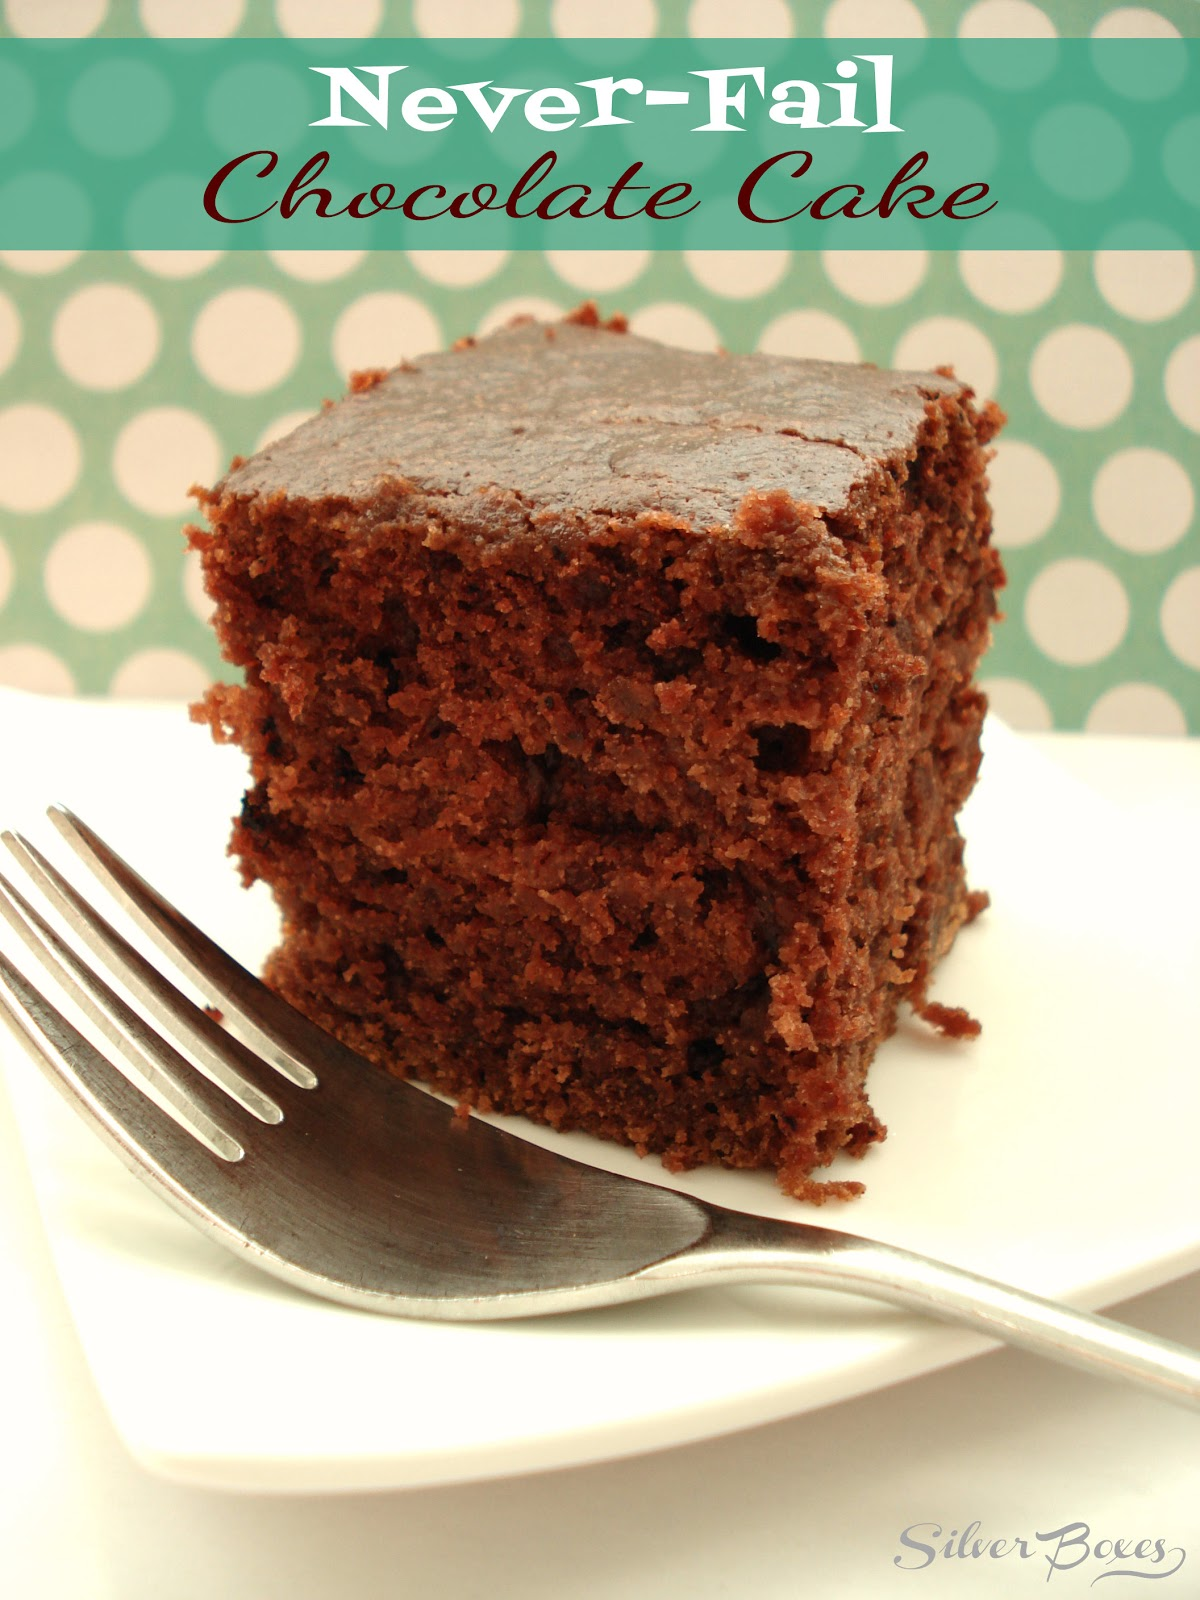 Chocolate Sheet Cake Made With Applesauce